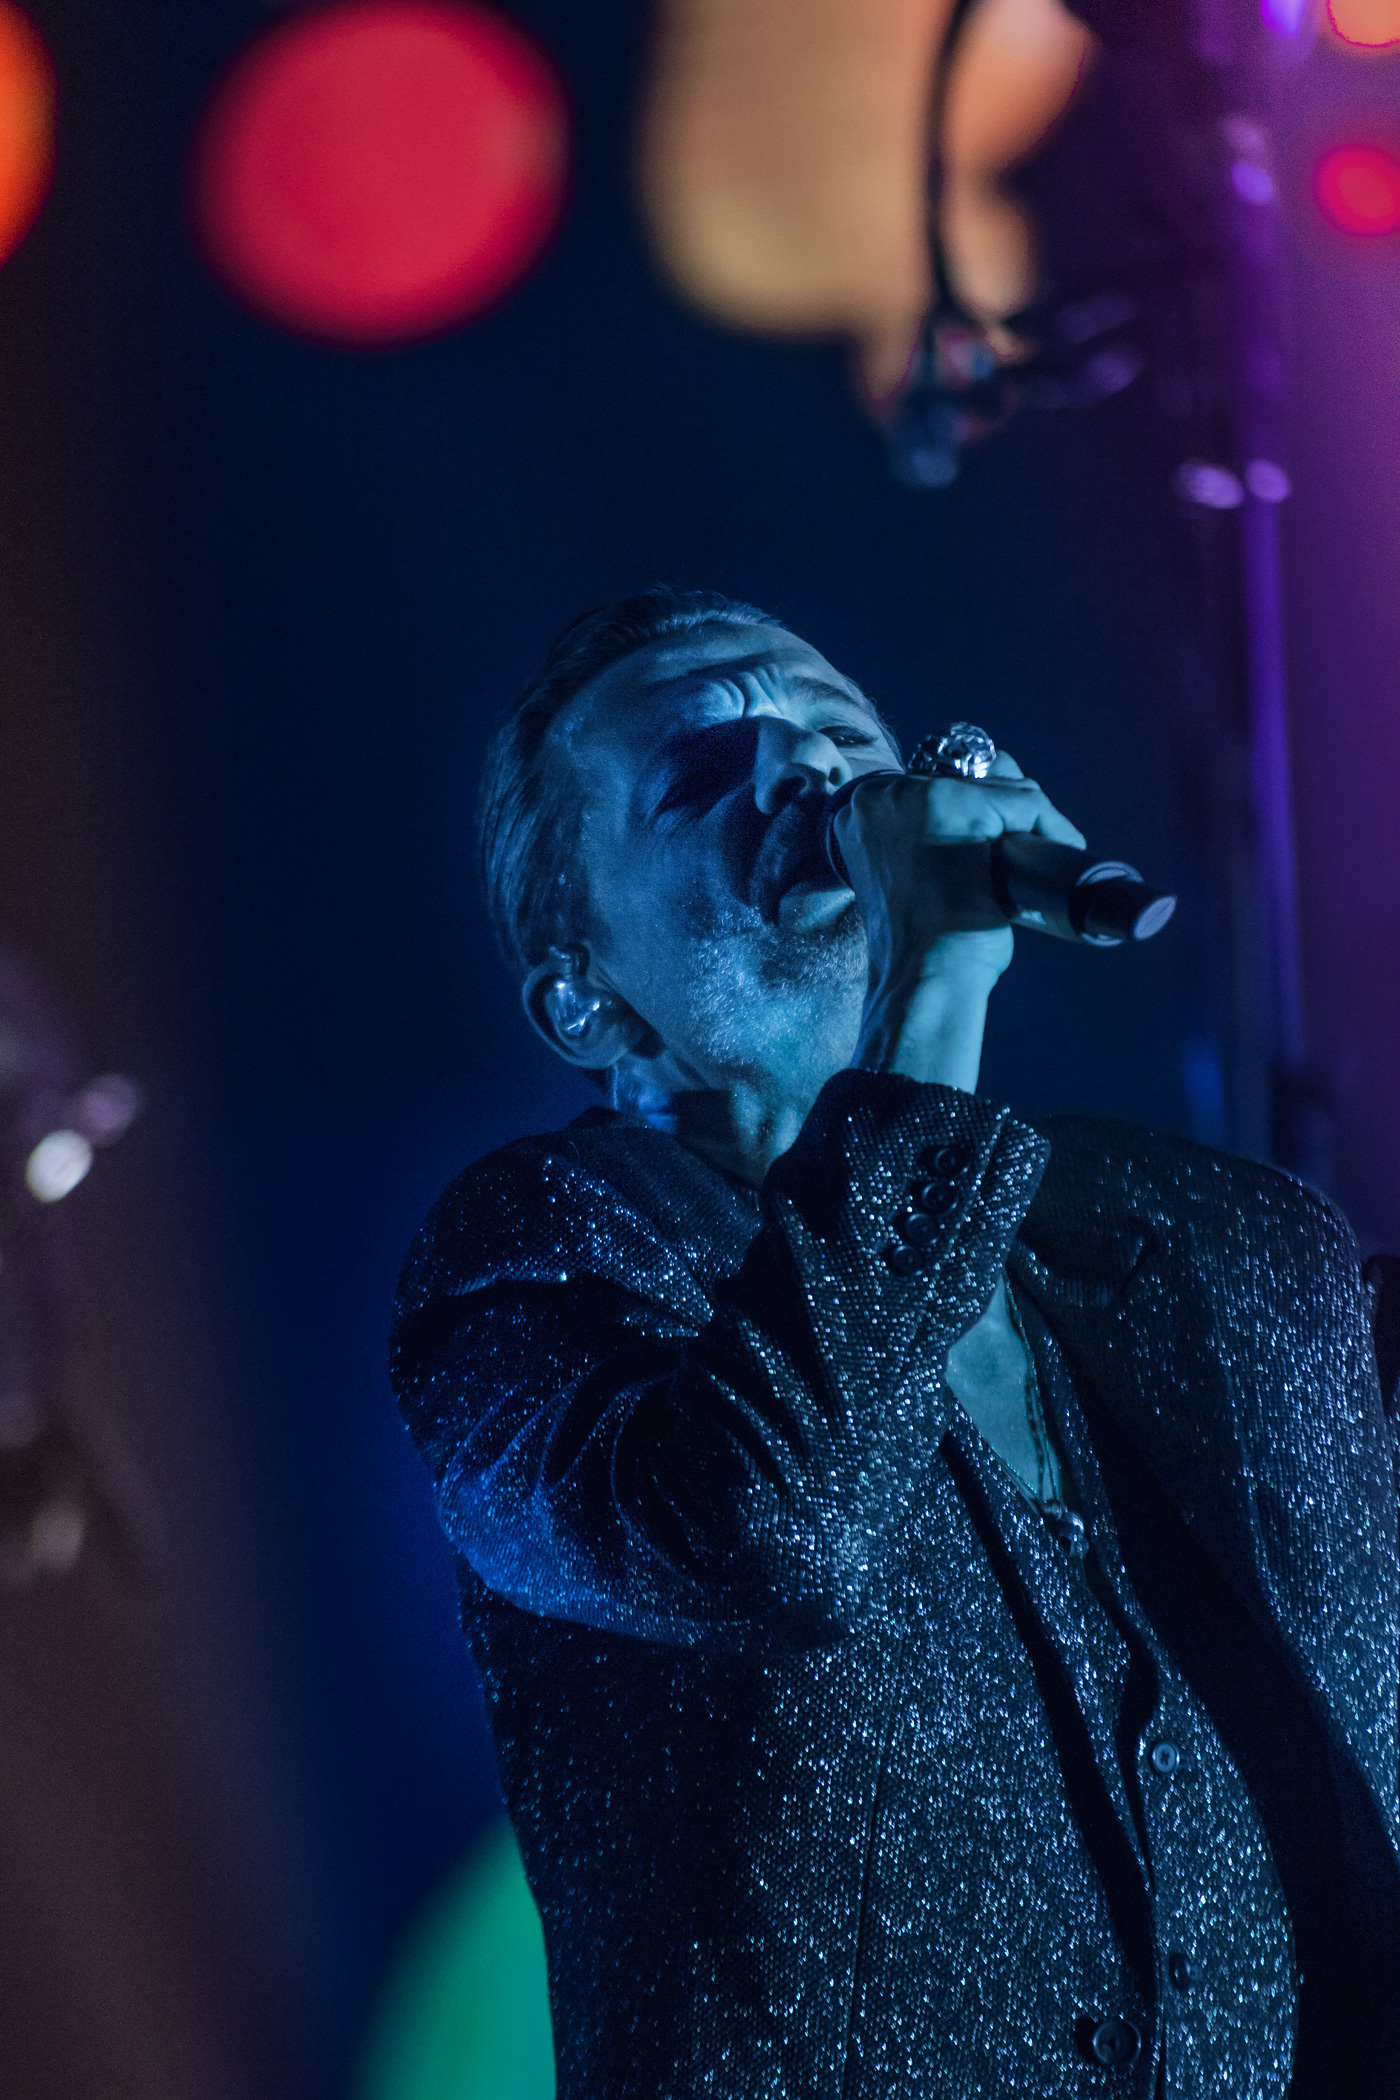 Depeche Mode Concert Photos - Denver, Colorado 2017 - Pepsi Center